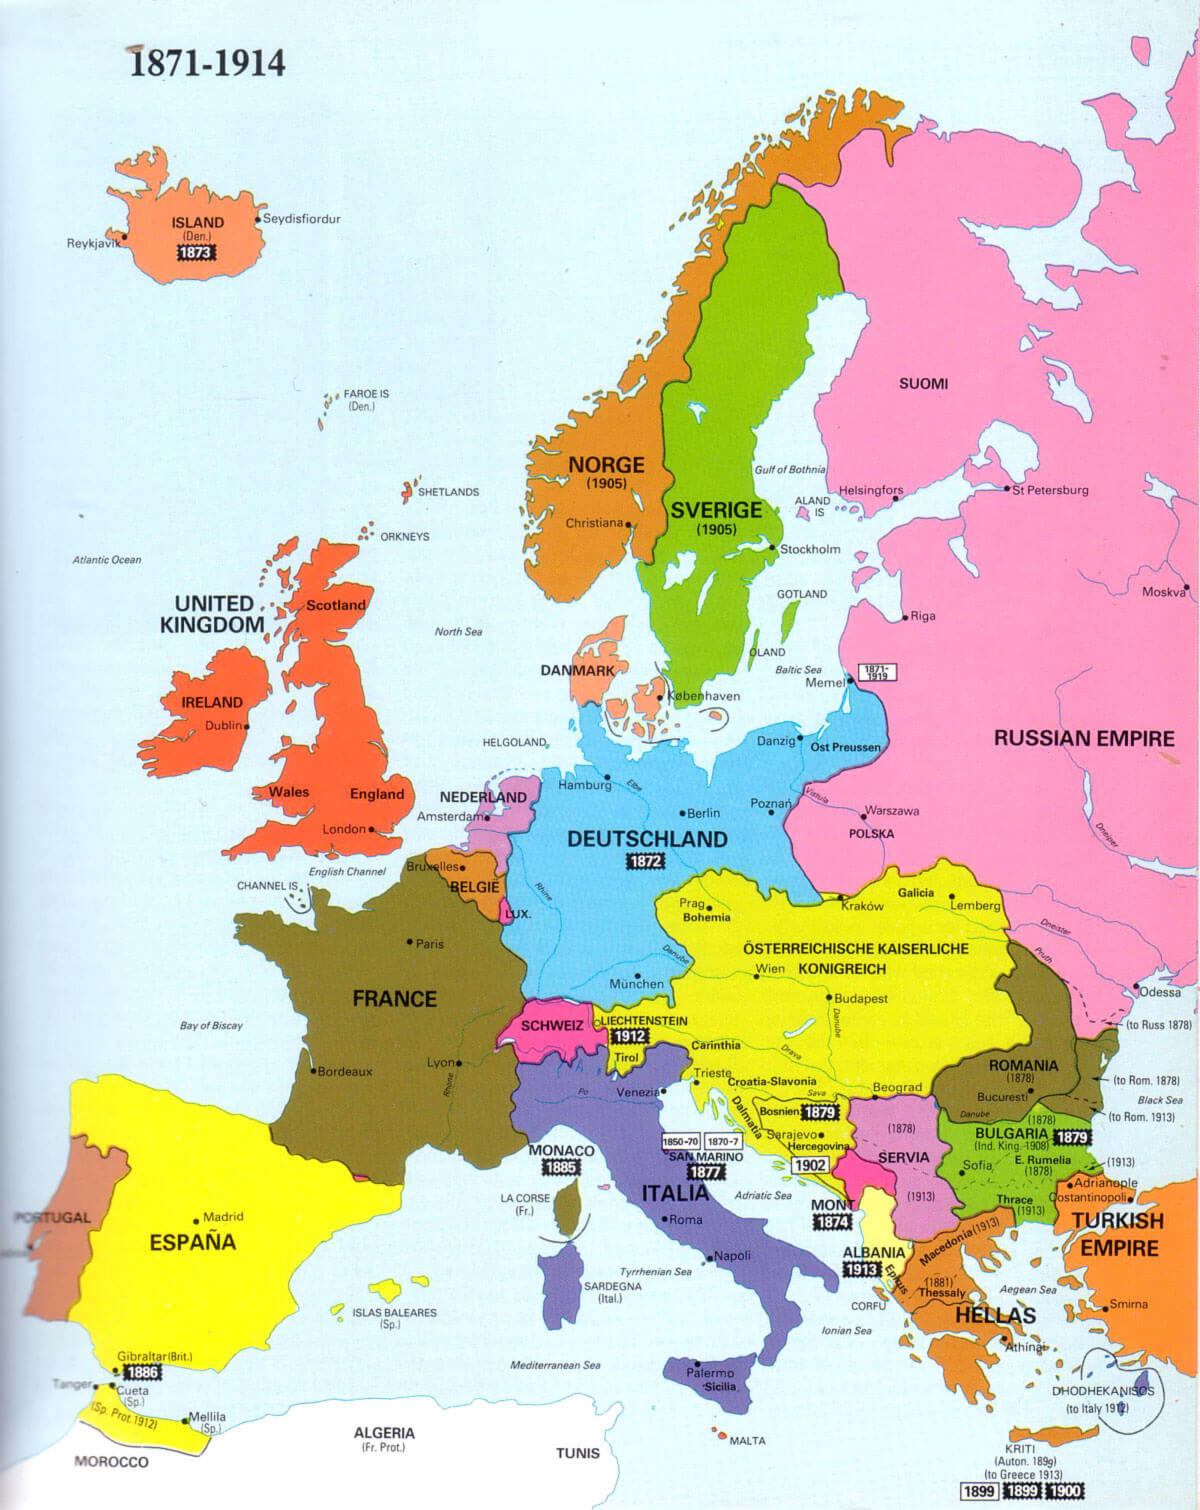 europa kart 1914 Europe Map 1871 1914 europa kart 1914